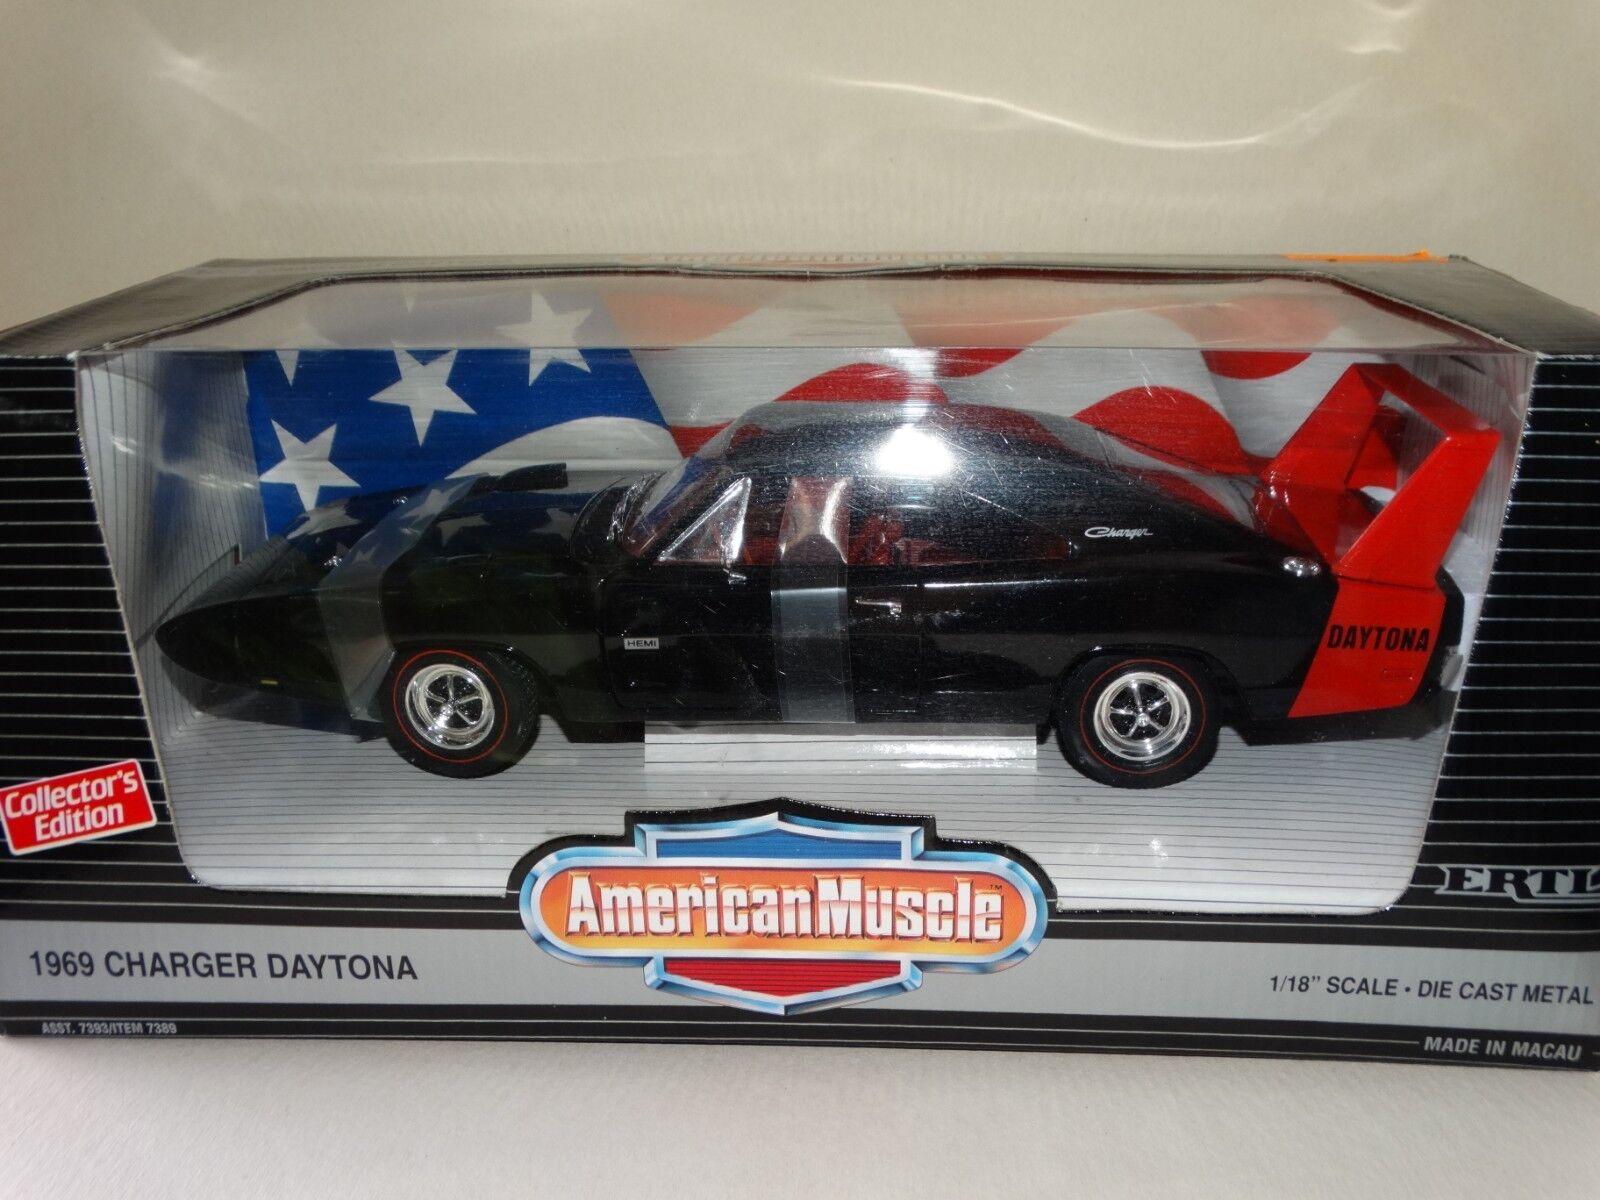 Ertl 1969 Dodge Charger Daytona Mopar 1 18 Scale Diecast Diecast Diecast American Muscle Car Blk bf49c3